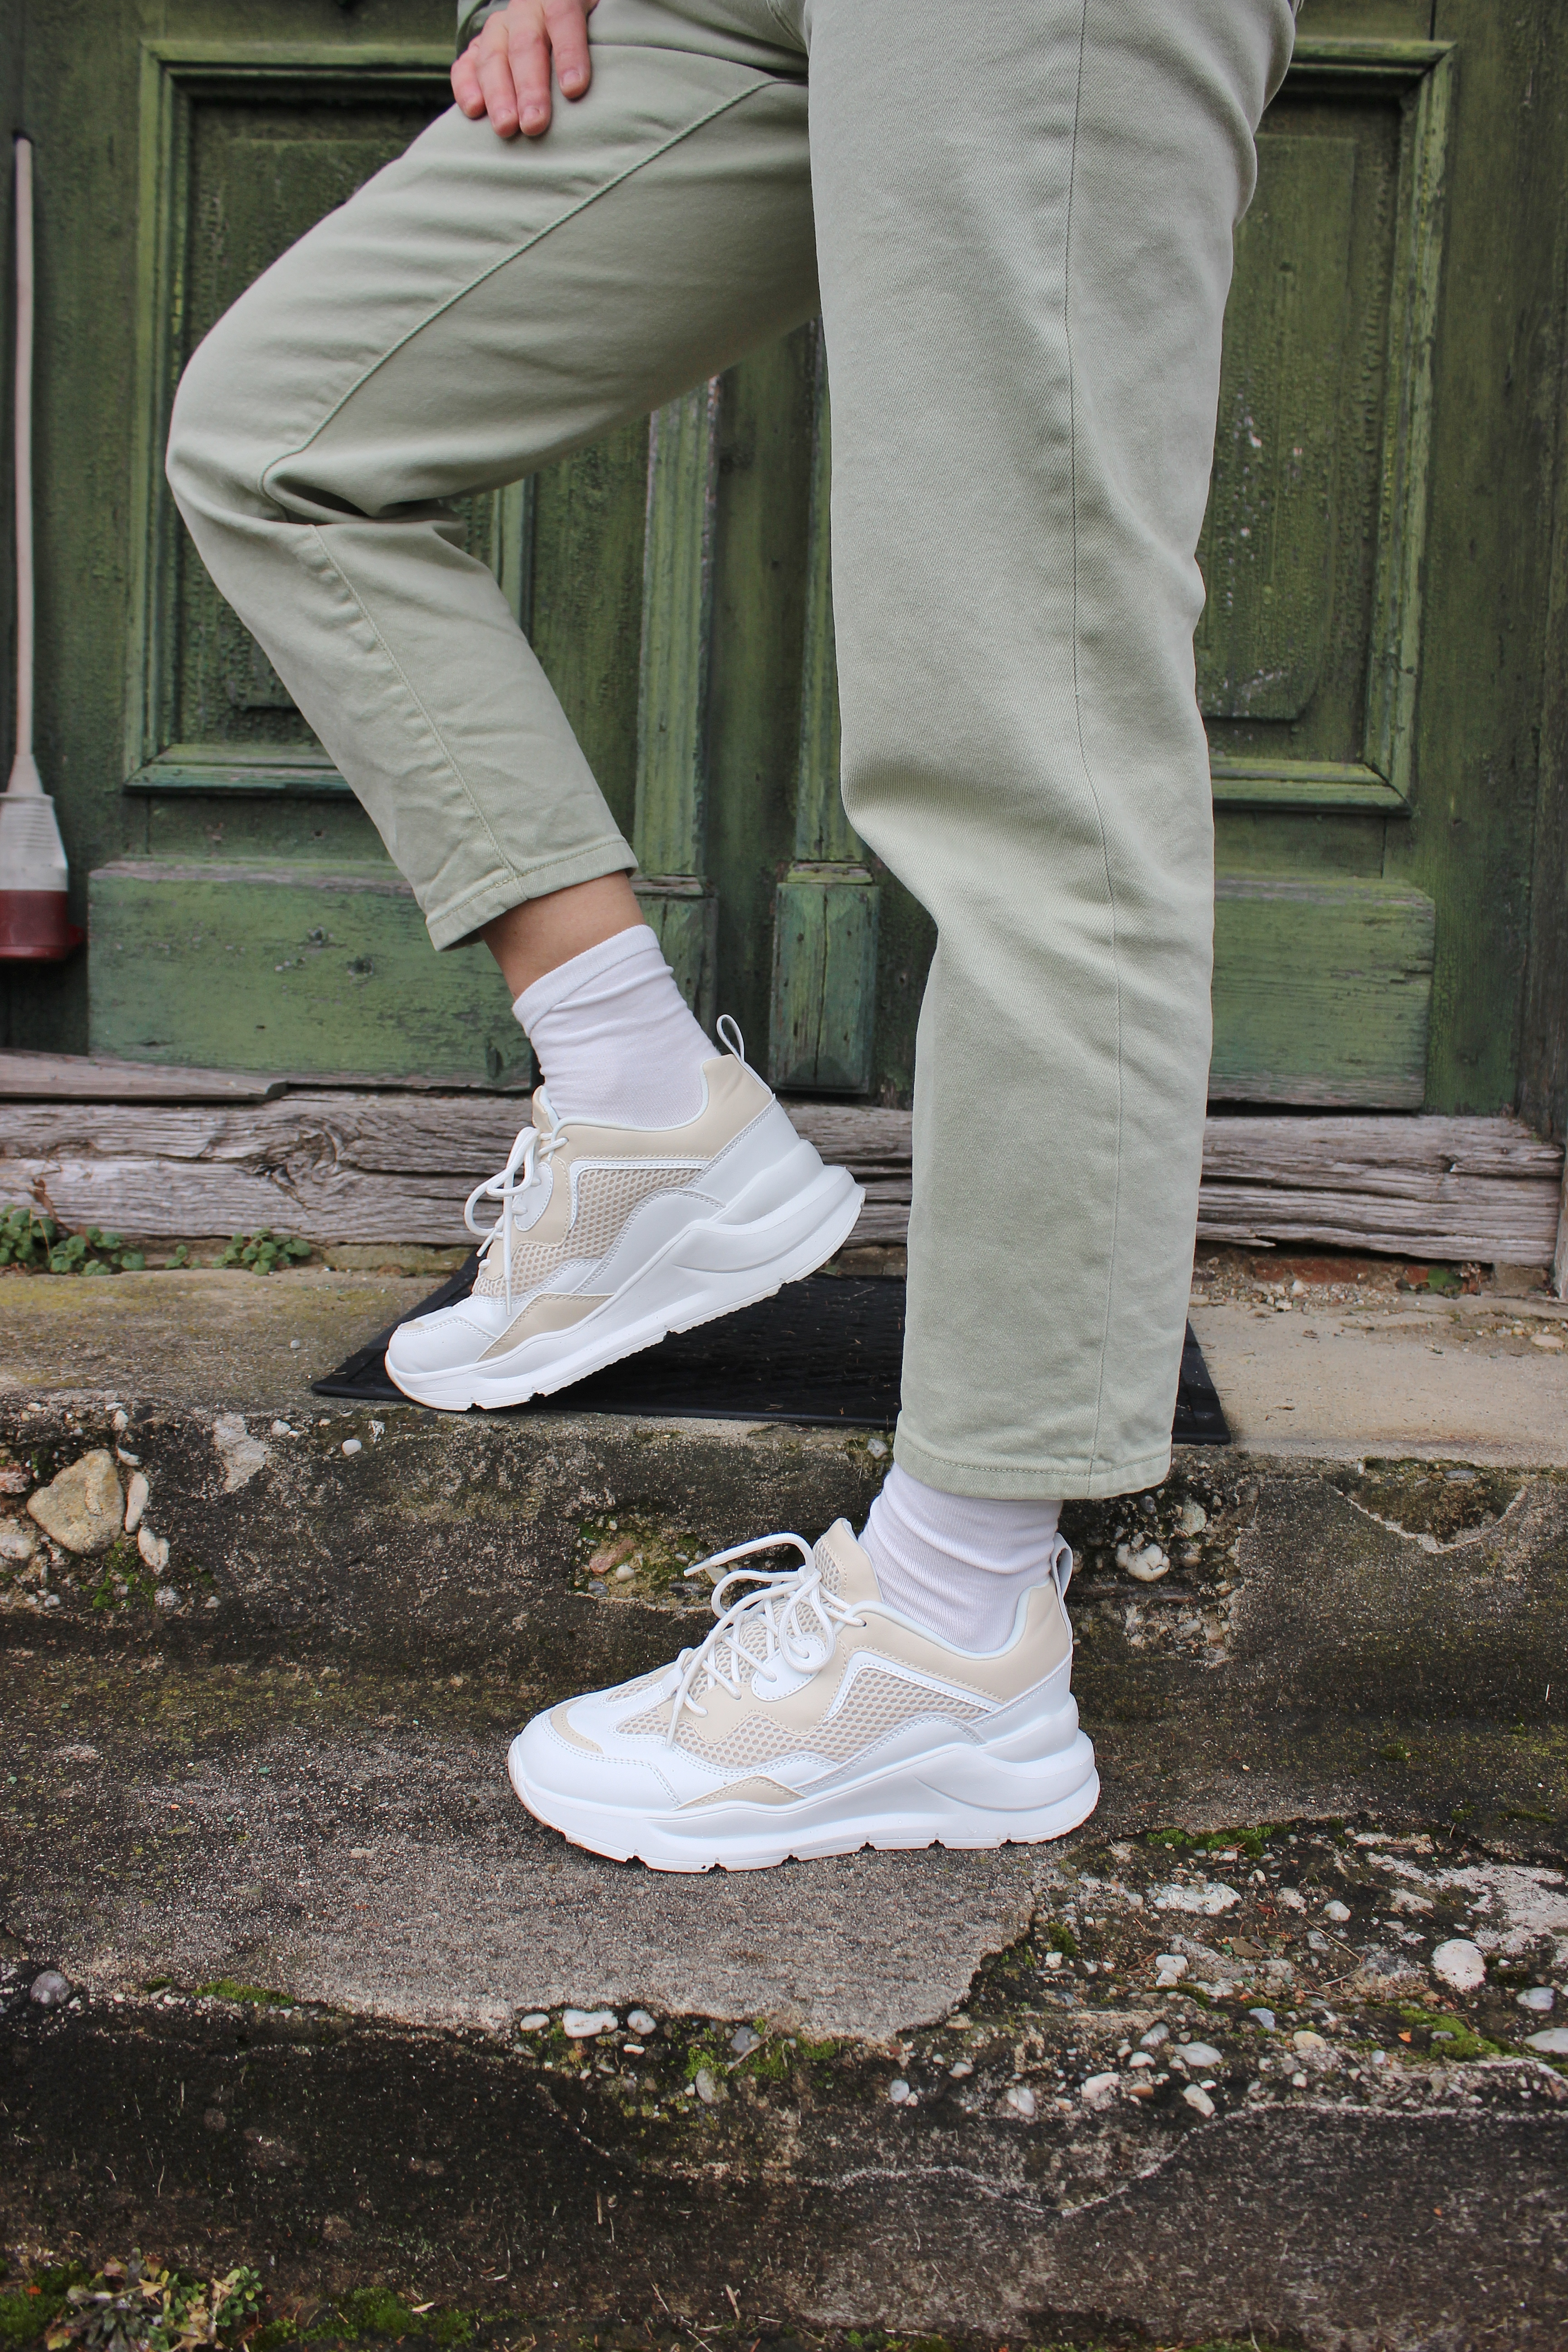 Grün Trend-Nakd Fashion-Grüne Winterjacke-CCC Shoes and Bags Sneakers Deezee-Beige-carrieslifestyle-Tamara Prutsch